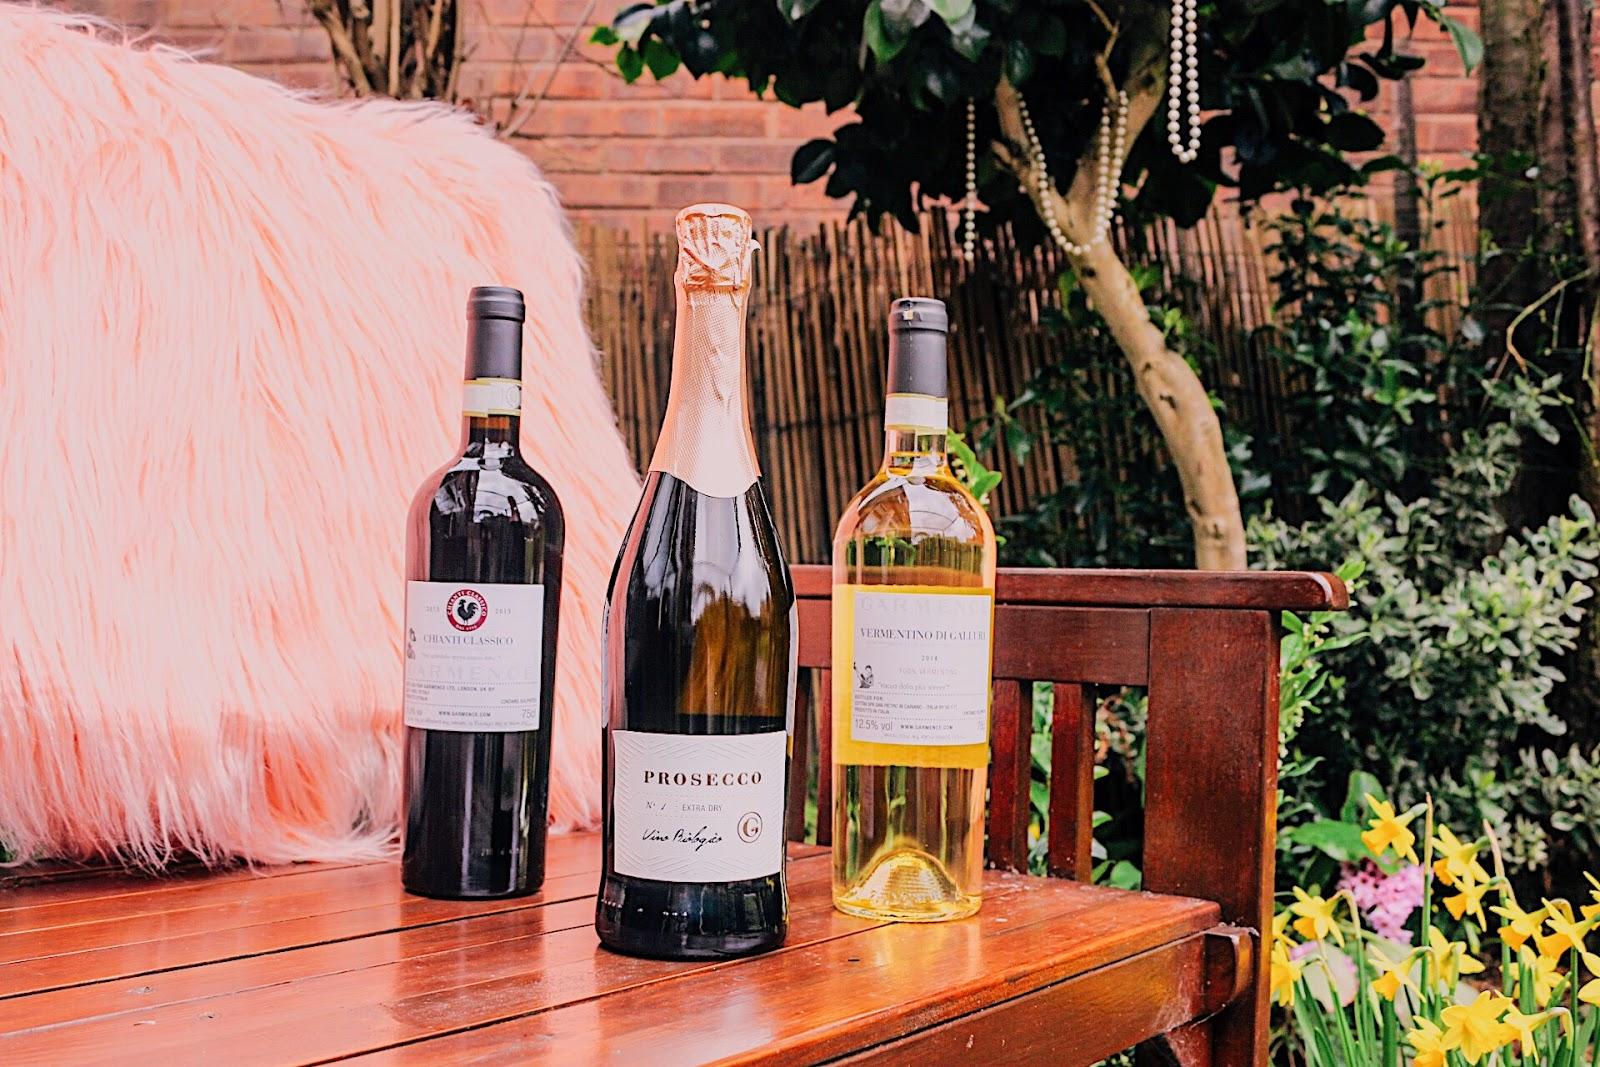 garmence, garmence wine review, garmence uk, wine delivery uk, wine online uk